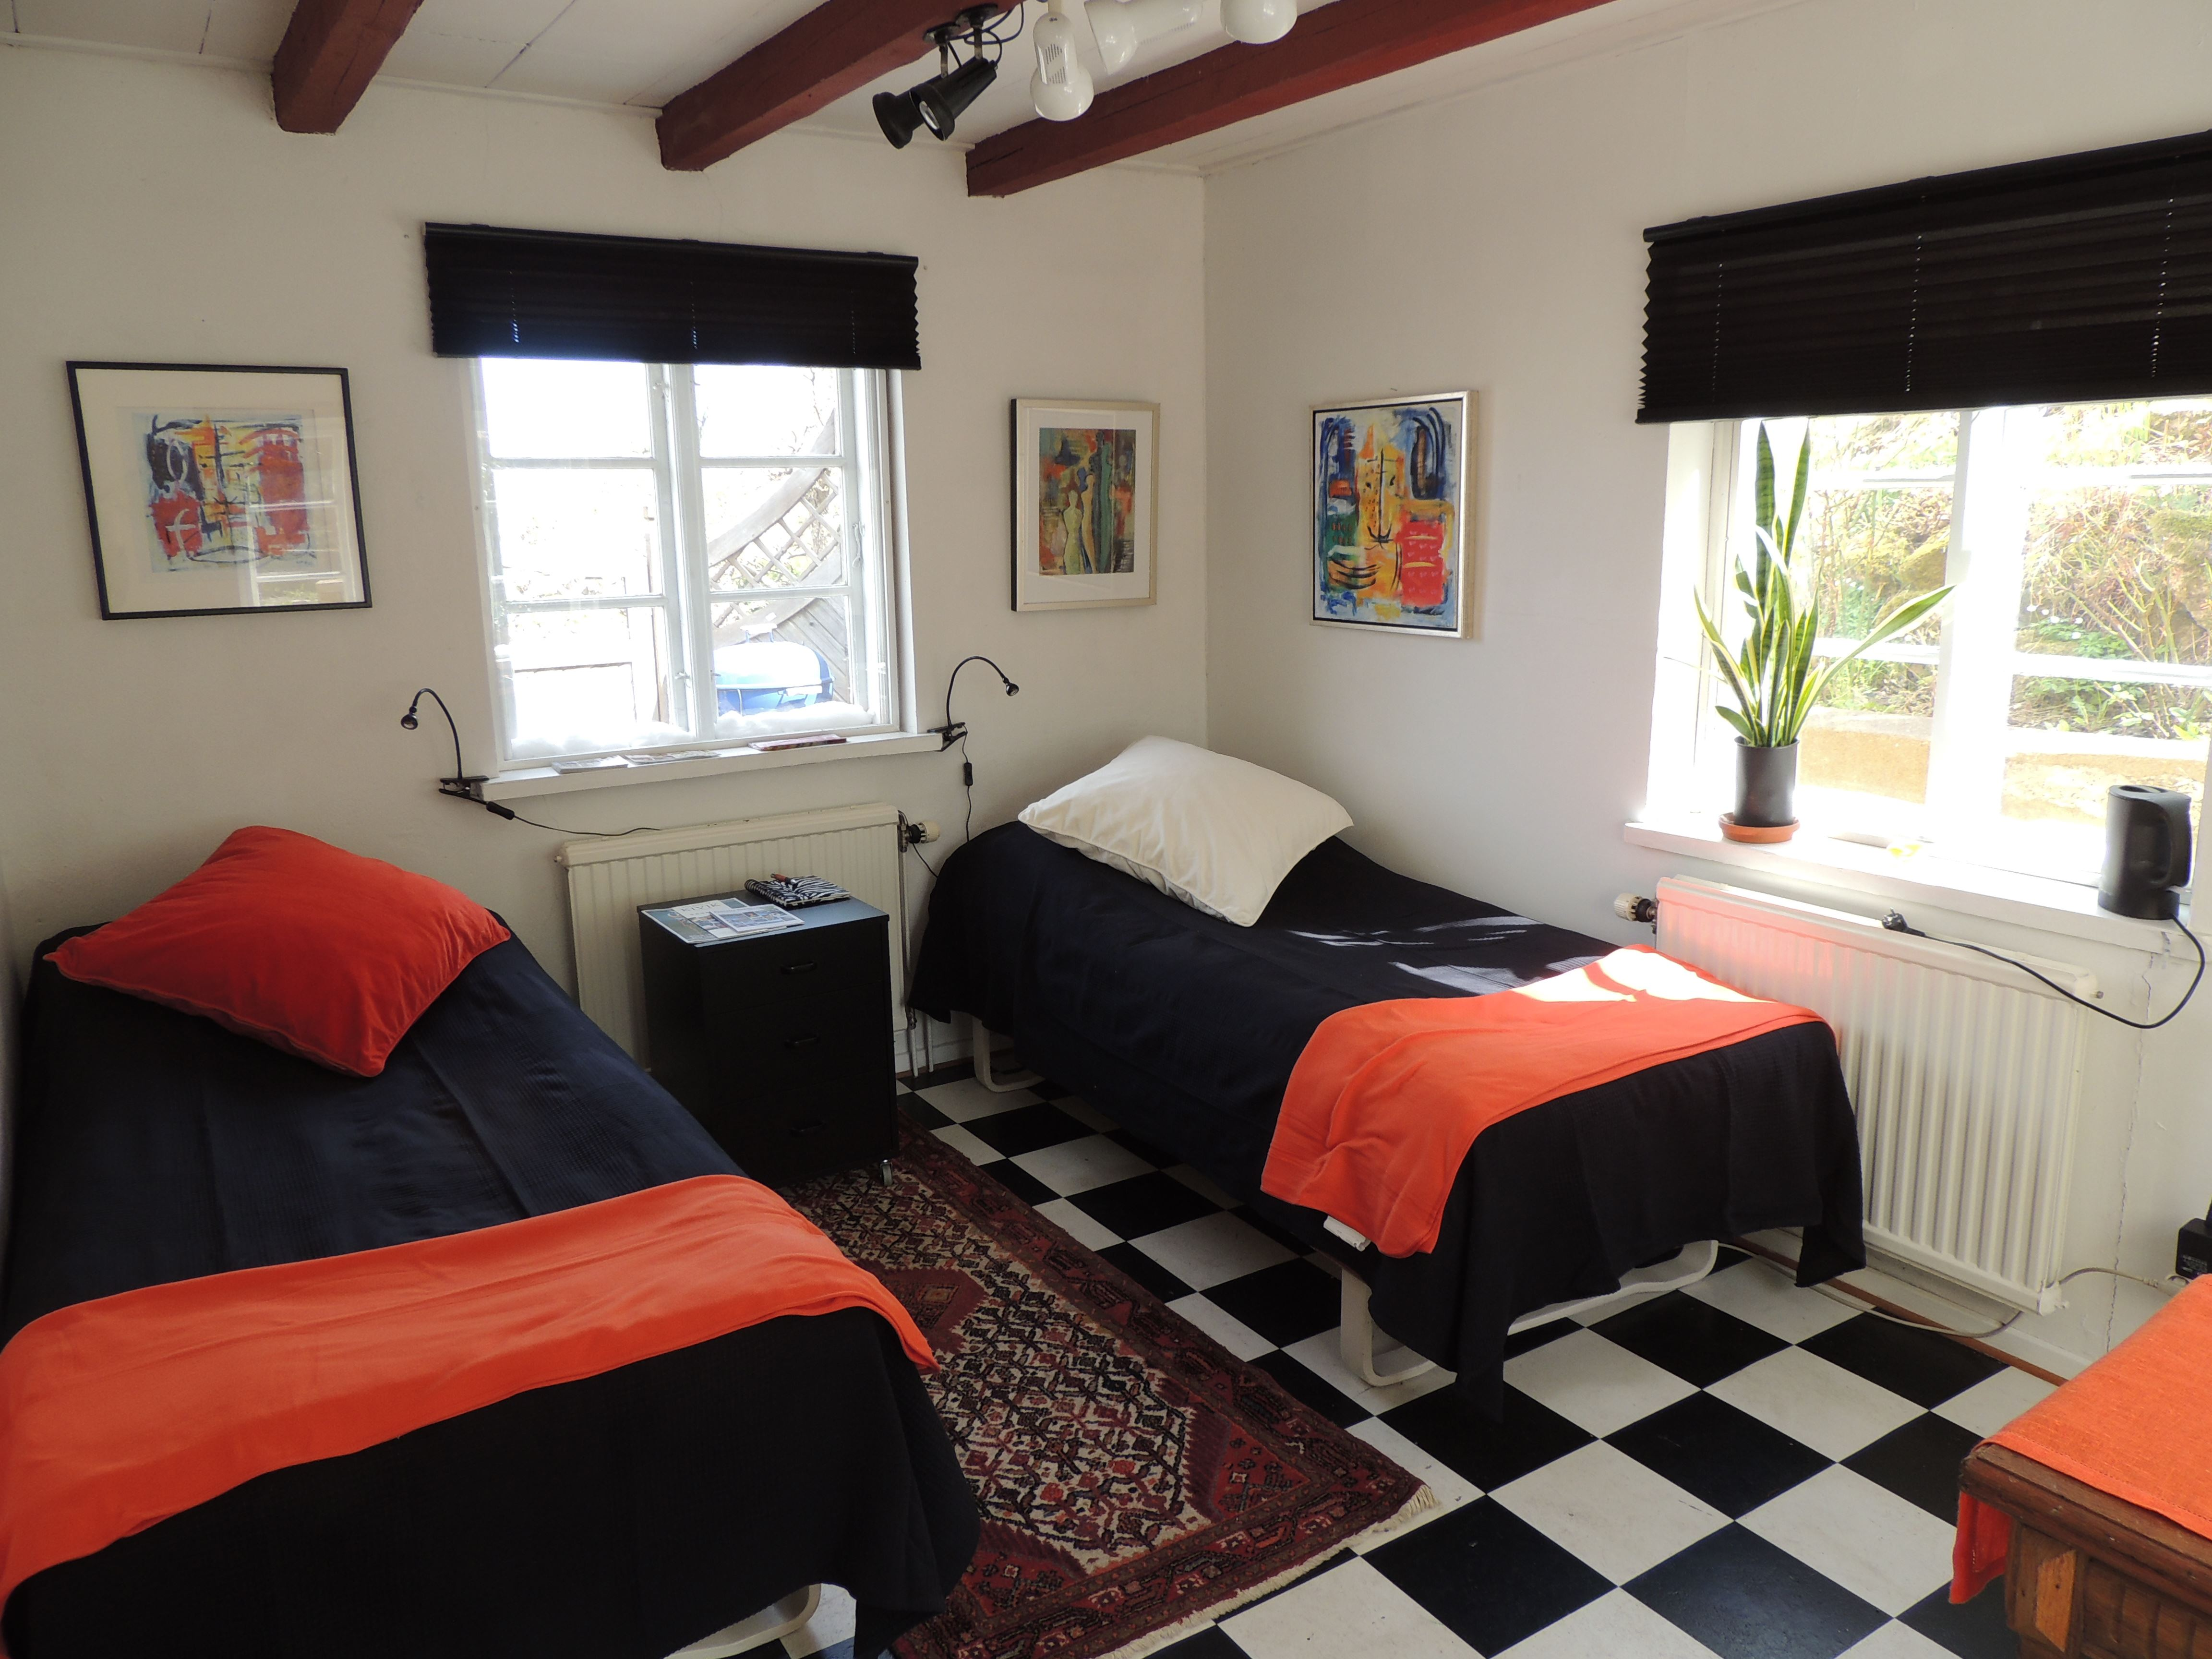 Stay at an artist home - Atelje Echi/Galleri Anima B&B